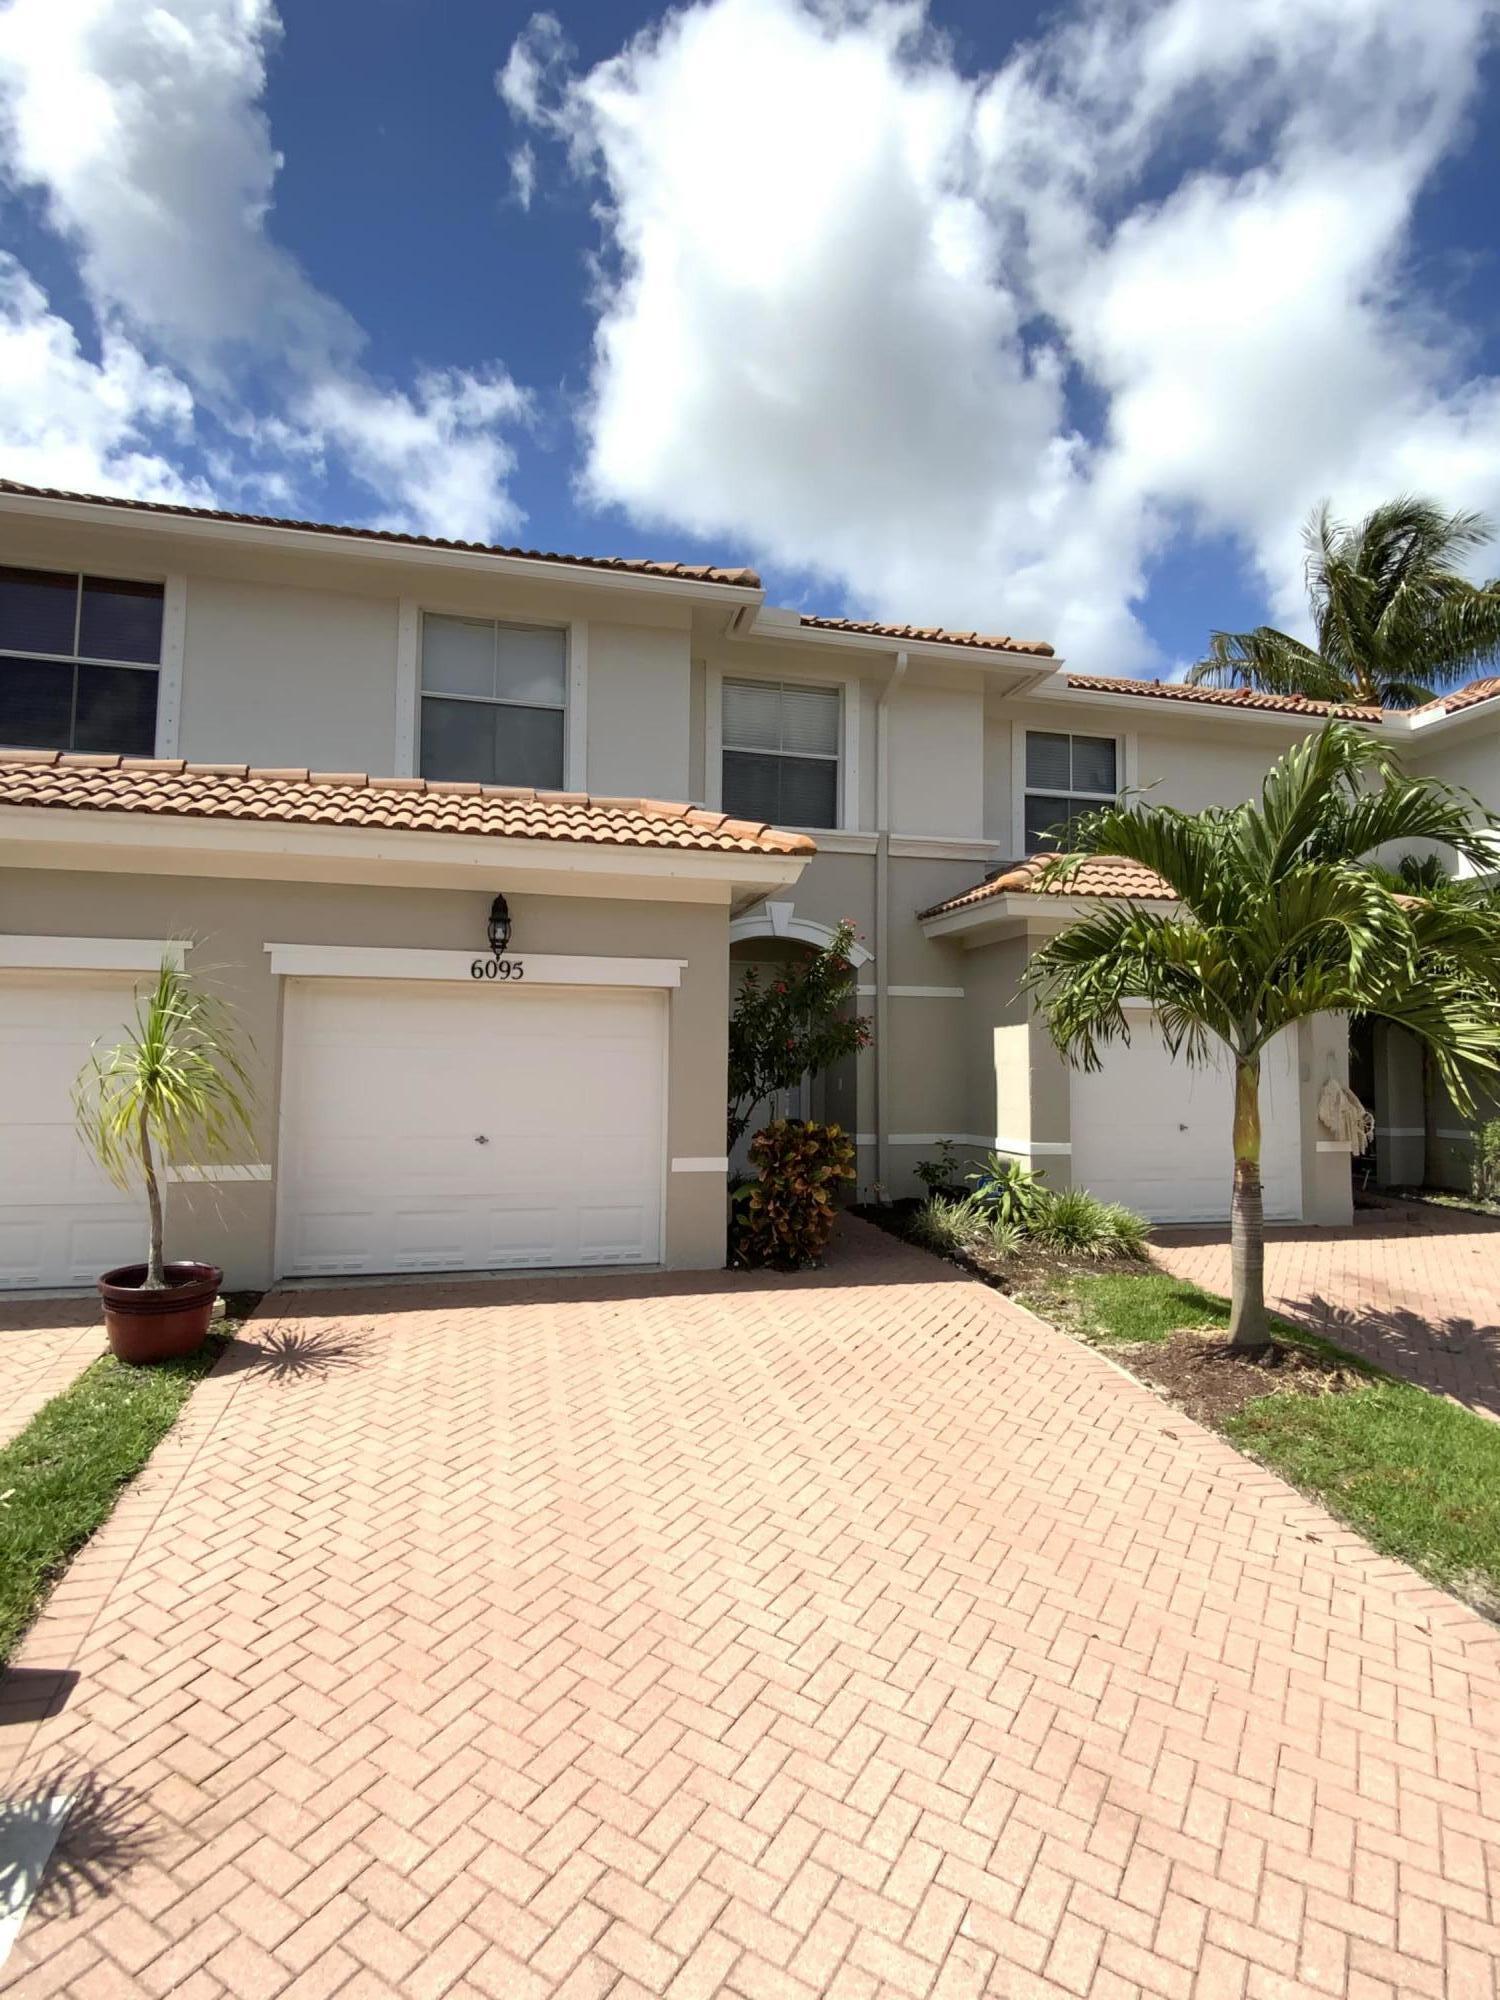 6095 Seminole Gardens Circle 6095 Palm Beach Gardens, FL 33418 photo 14